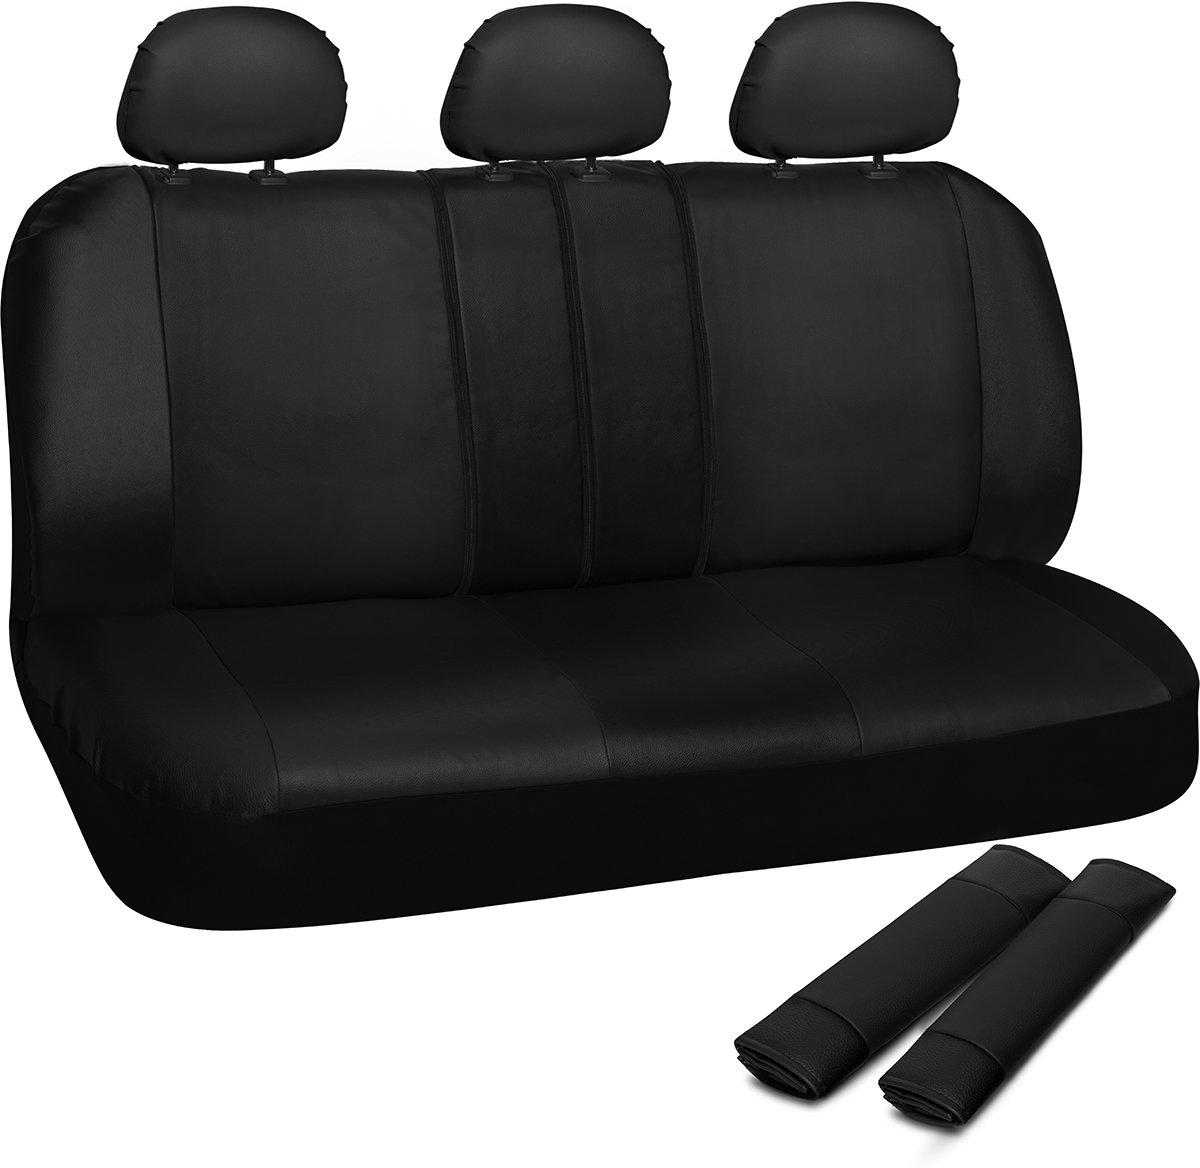 GGBAILEY D3517A-F2A-PNK Custom Fit Automotive Carpet Floor Mats for 1991 1994 1995 1996 1993 2001 1999 1992 1998 2003 1997 2002 2005 Acura NSX Pink Driver /& Passenger 2004 2000